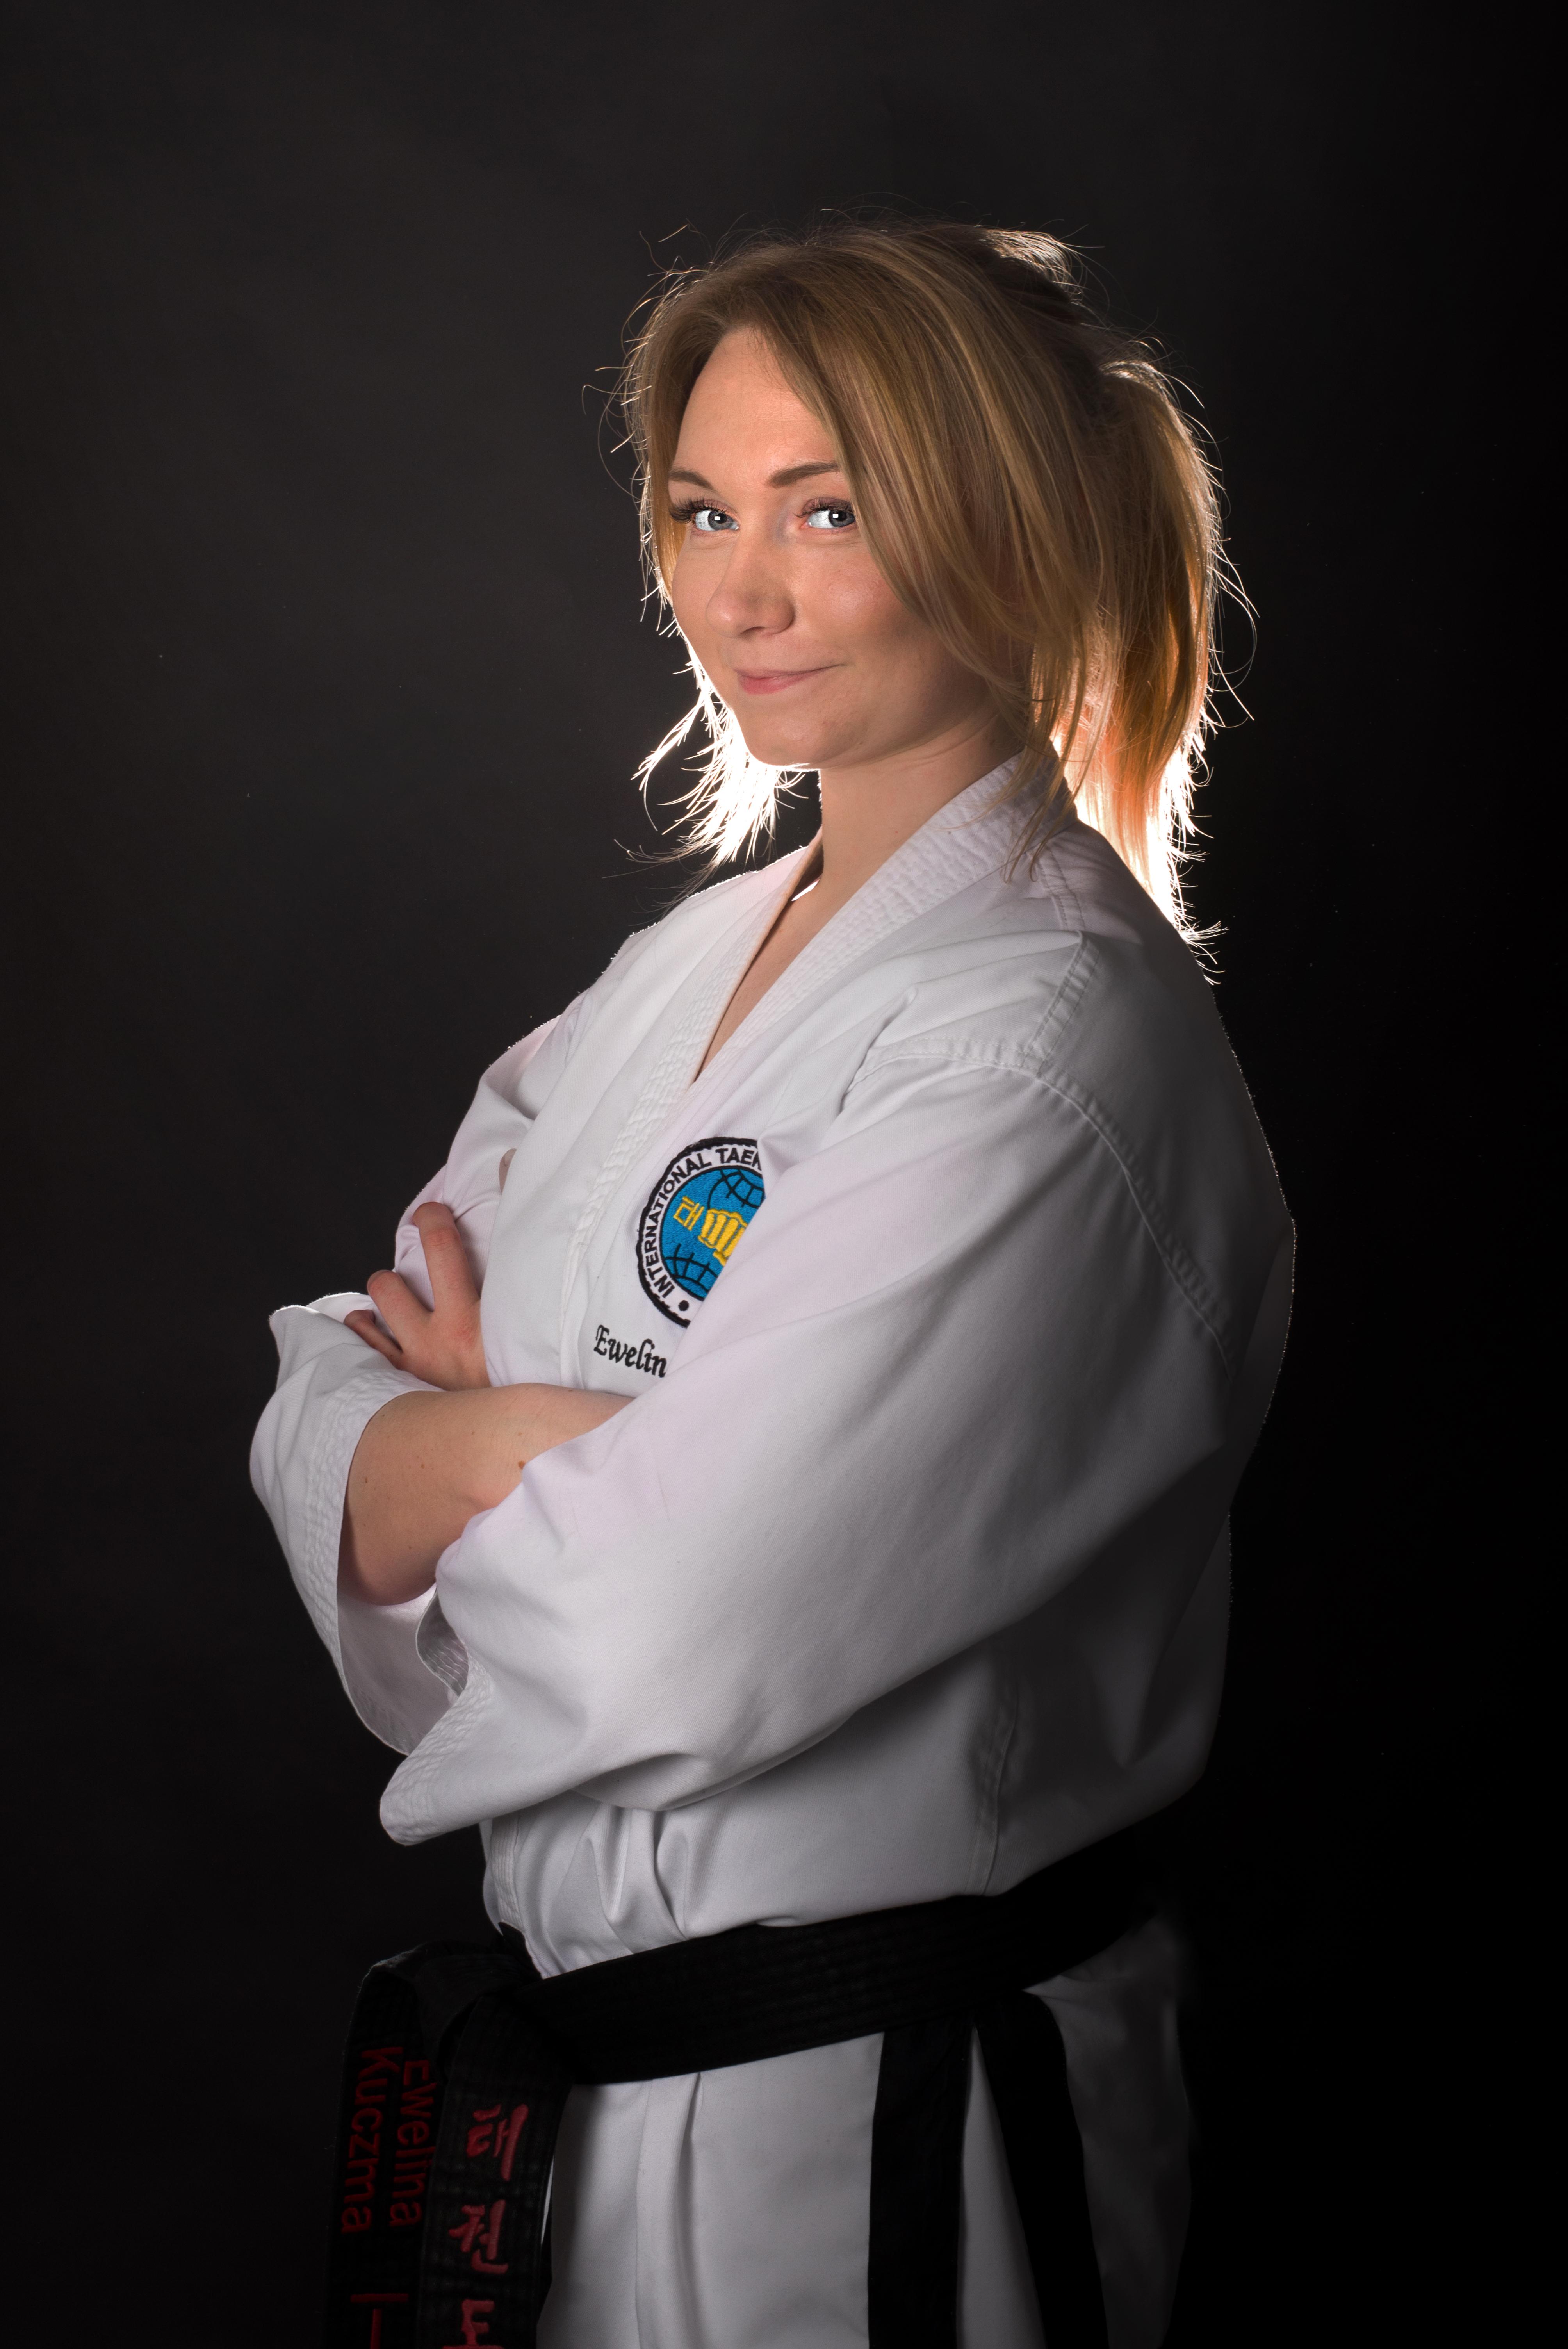 taekwondo brzeg dolny